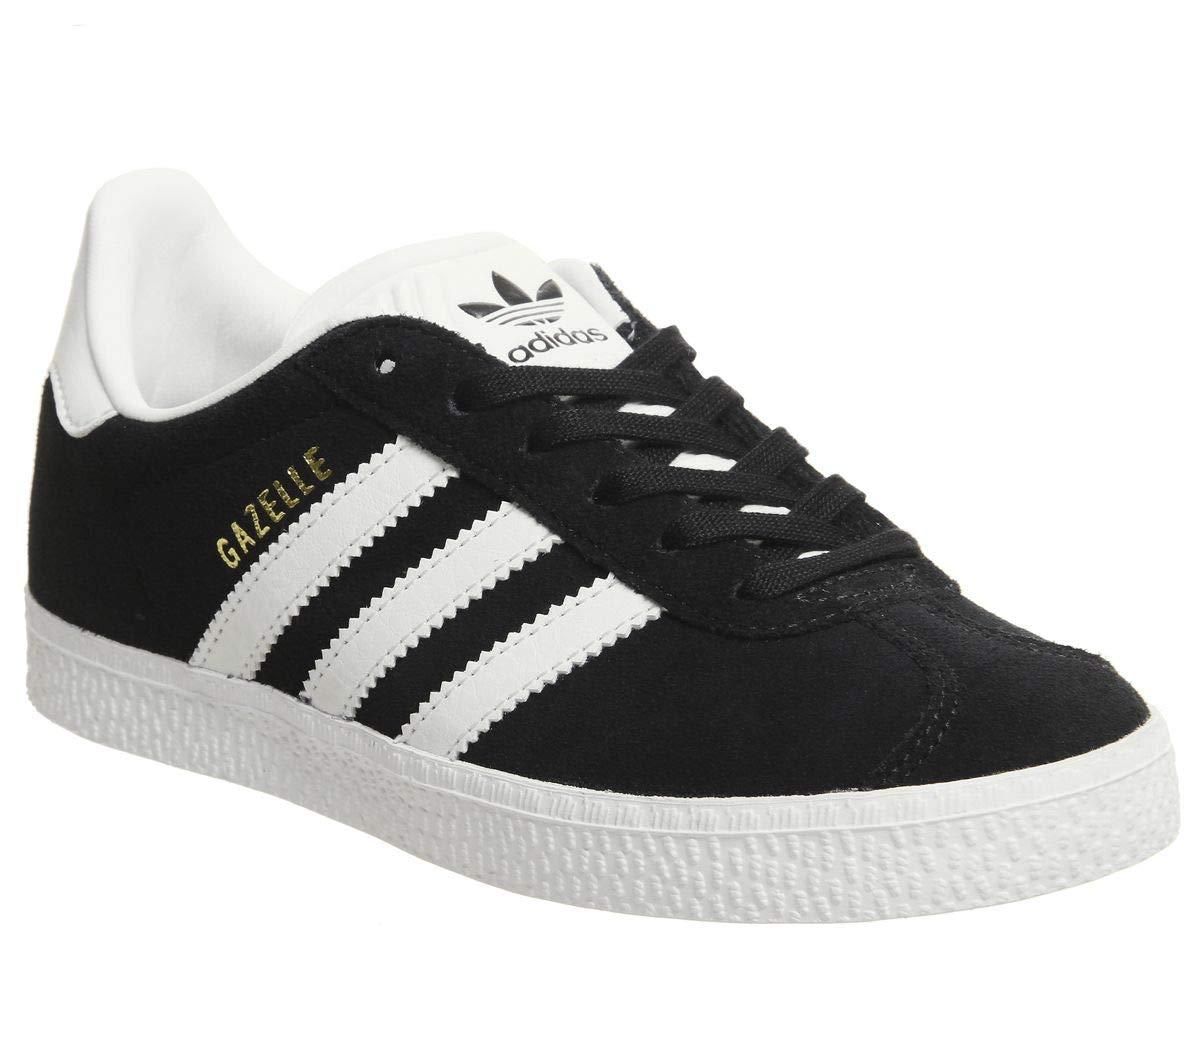 adidas Gazelle Infants Sneakers Black